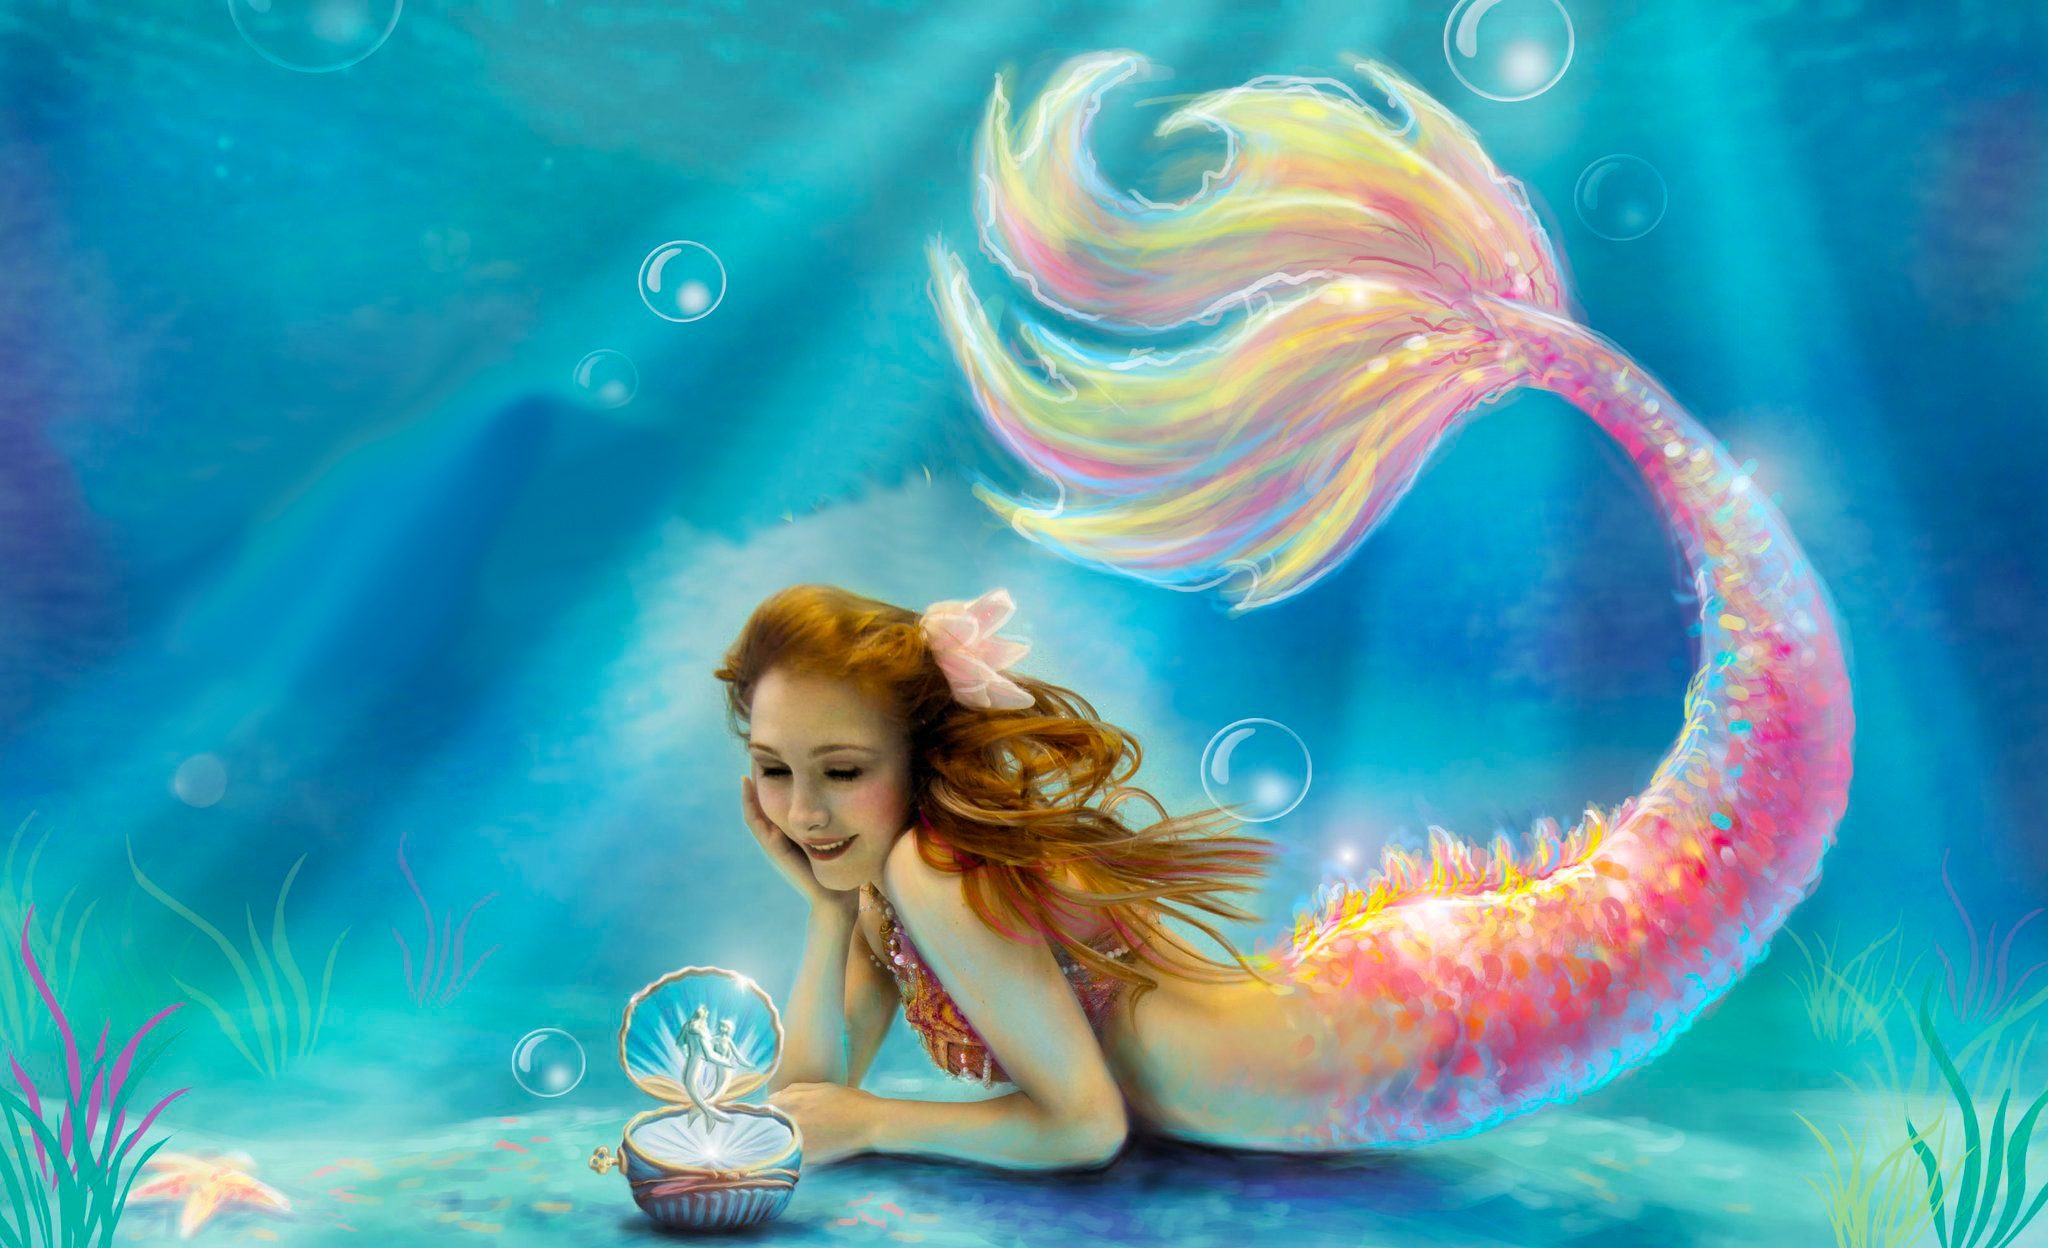 Mermaid Backgrounds, Compatible - PC, Mobile, Gadgets  2048x1248 px